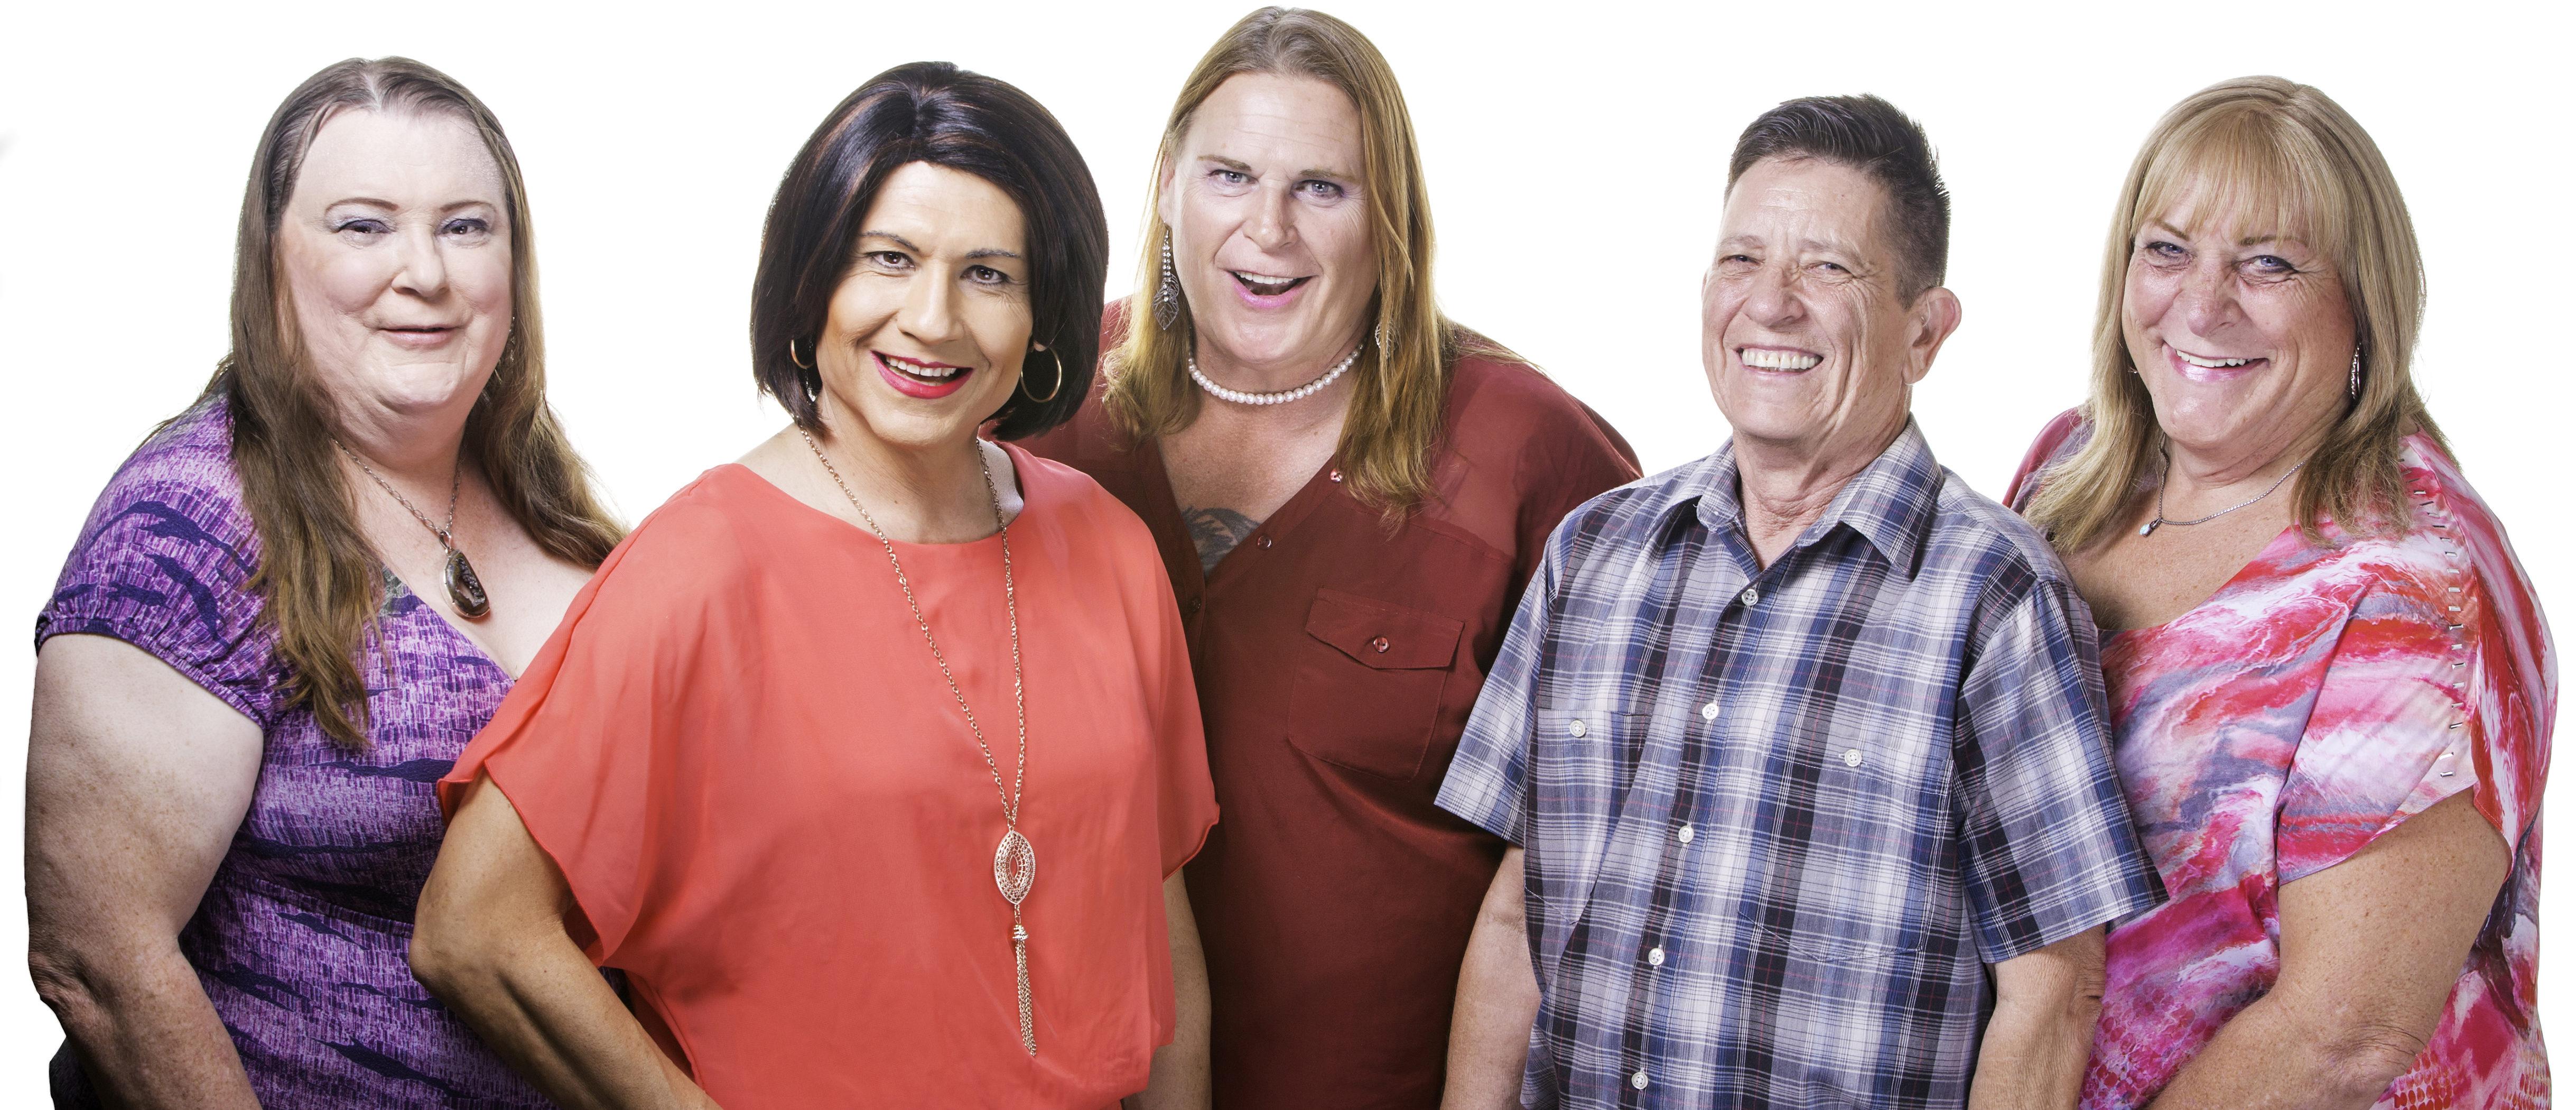 Transgender Adults (Shutterstock/Creatista)